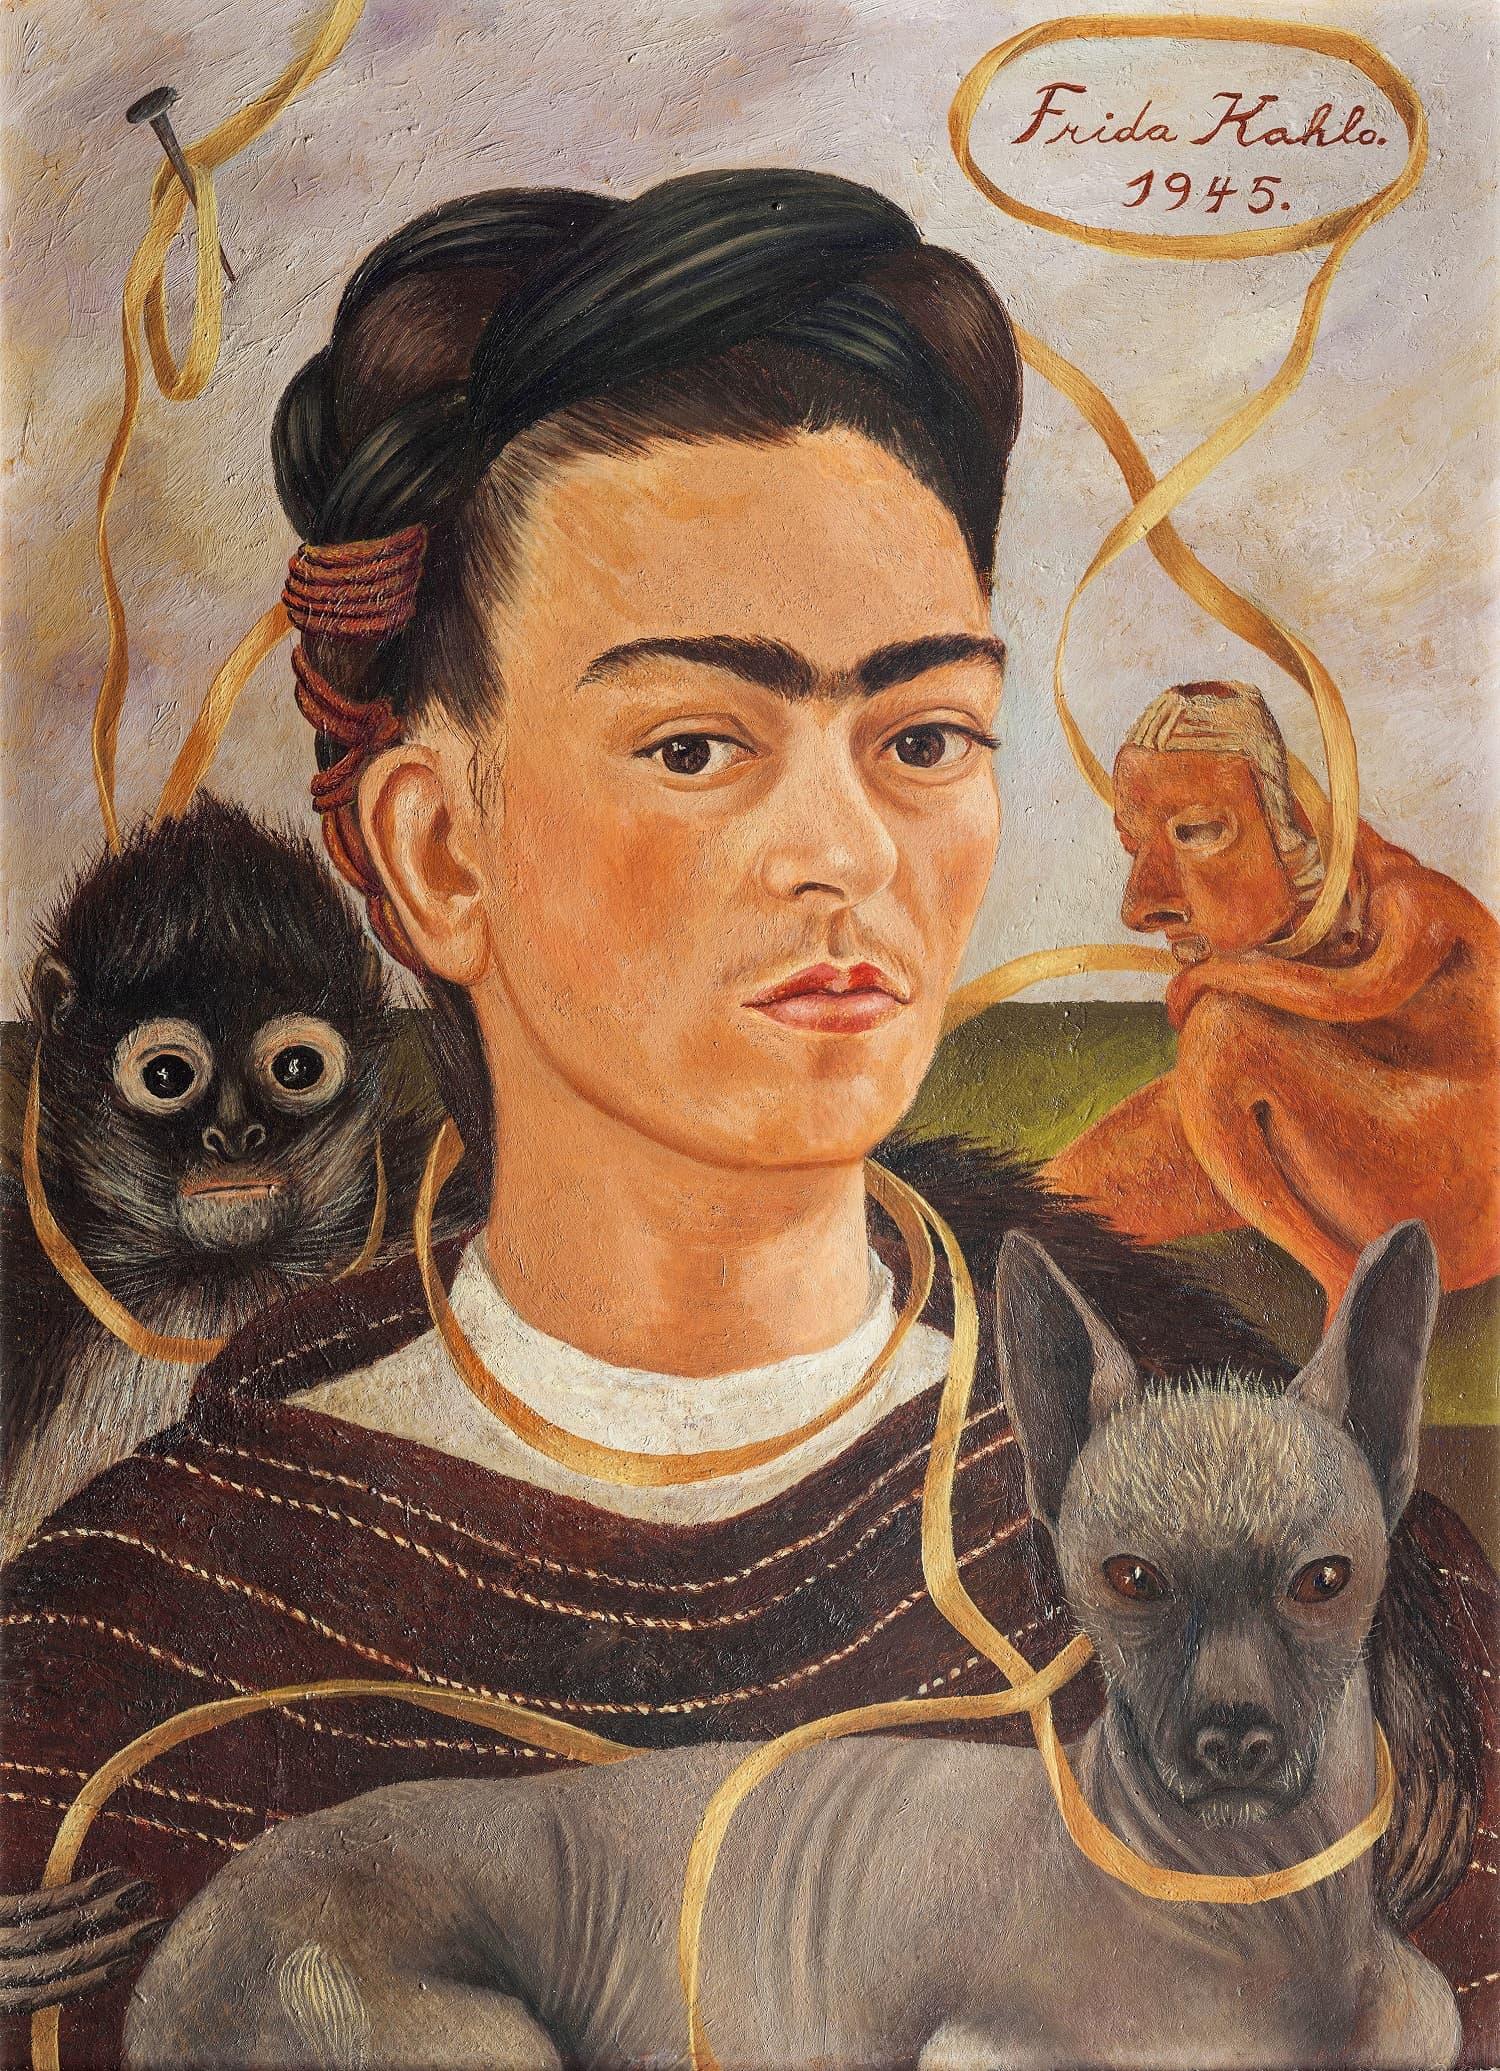 Self-portrait with Small Monkey, 1945 Oil on masonite, 56 x 41.5 cm (22 x 16⅜ in.)